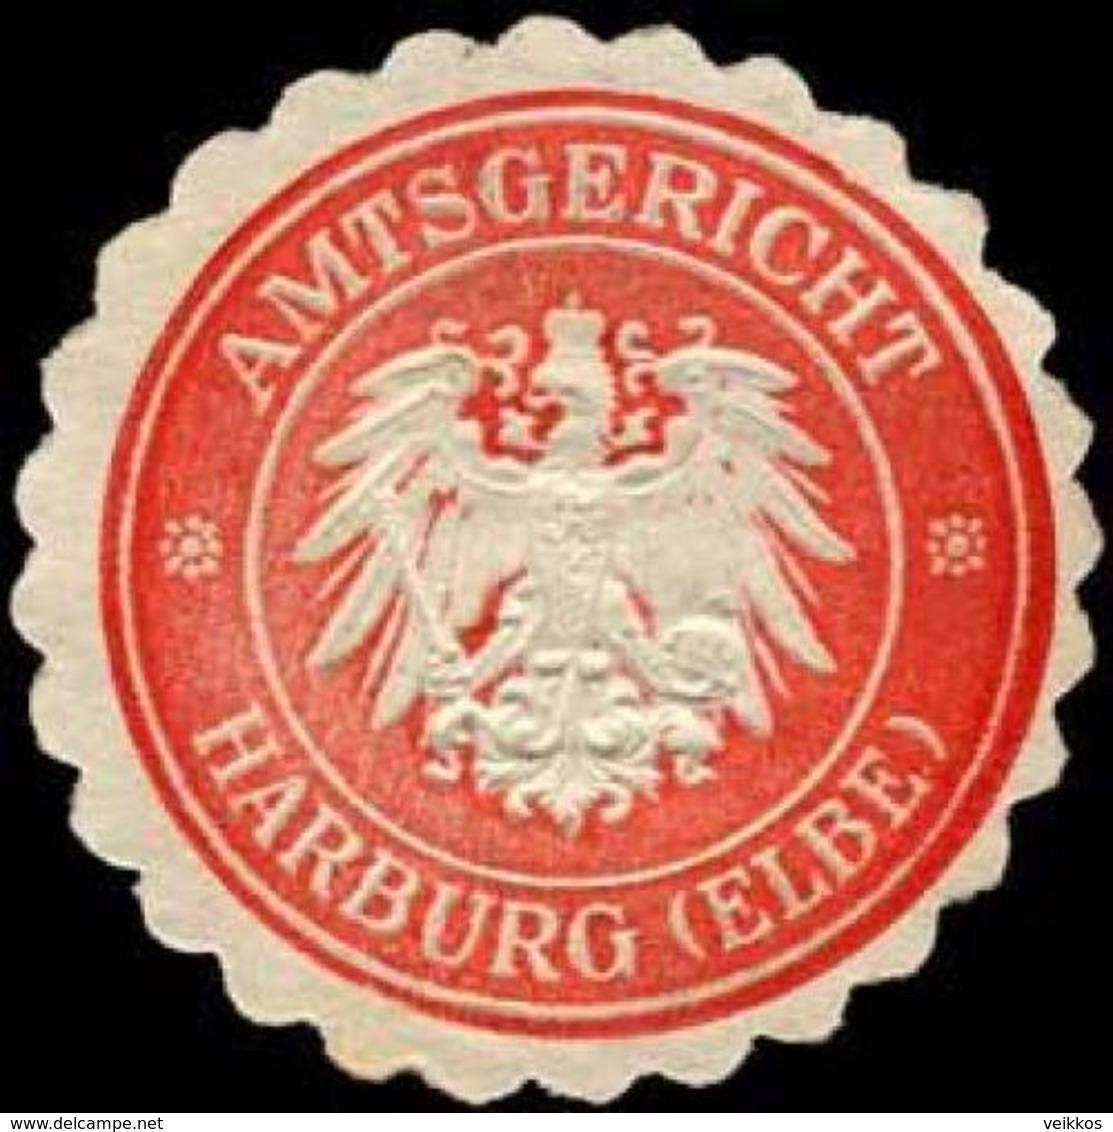 Harburg / Elbe: Amtsgericht - Harburg (Elbe) Siegelmarke - Cinderellas